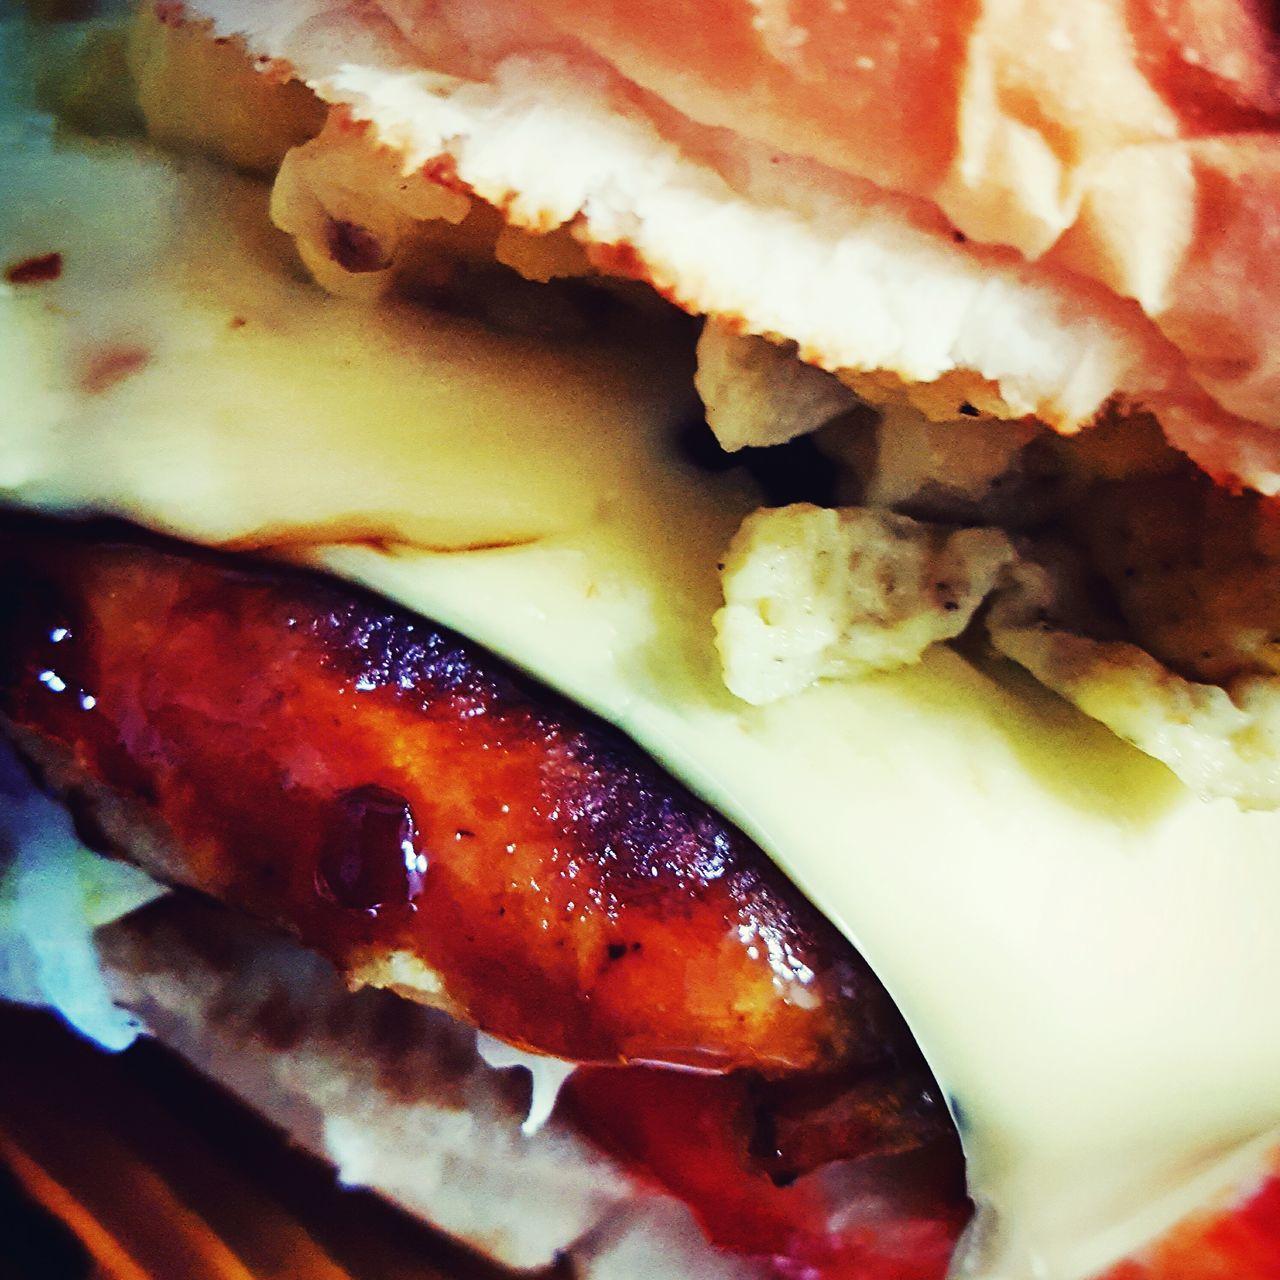 Susu burger Learn To Feed Myself My Point Of View Eyeem Food Lover Burgers Home Made Cheesy Fresh On Eyeem  The Week Of Eyeem Dinner Yummy In My Tummy Yum Yum Foods Meat Chops My Recipe My Cooking Diaries Cheese Burger Lover